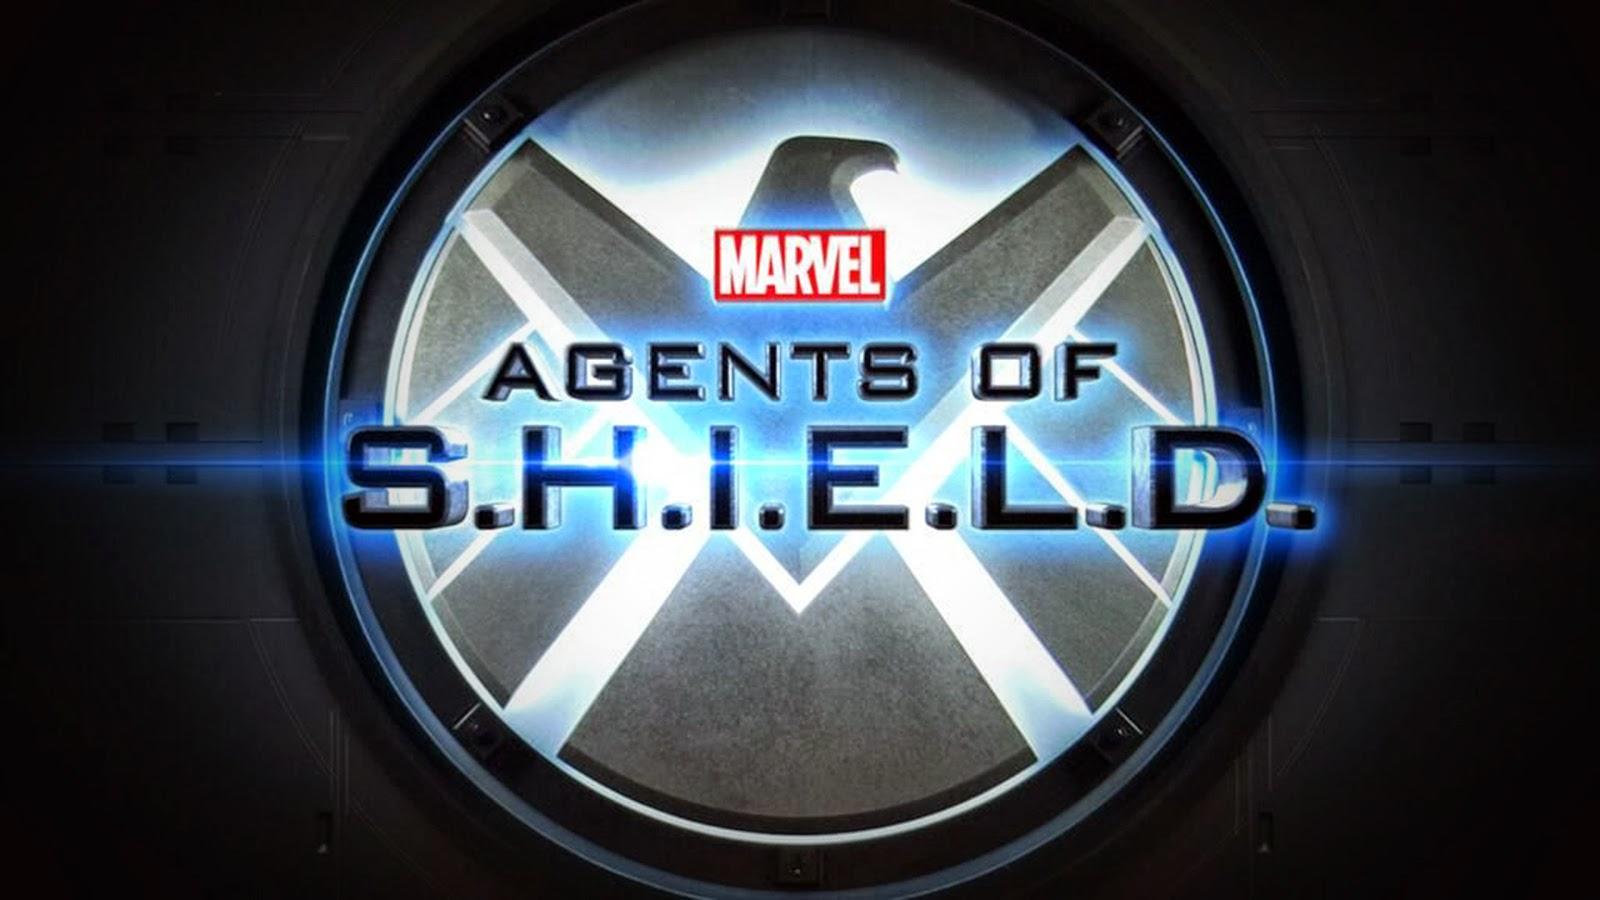 Marvel Agents of Shield Logo Wallpaper HiresMOVIEWALLcom 1600x900